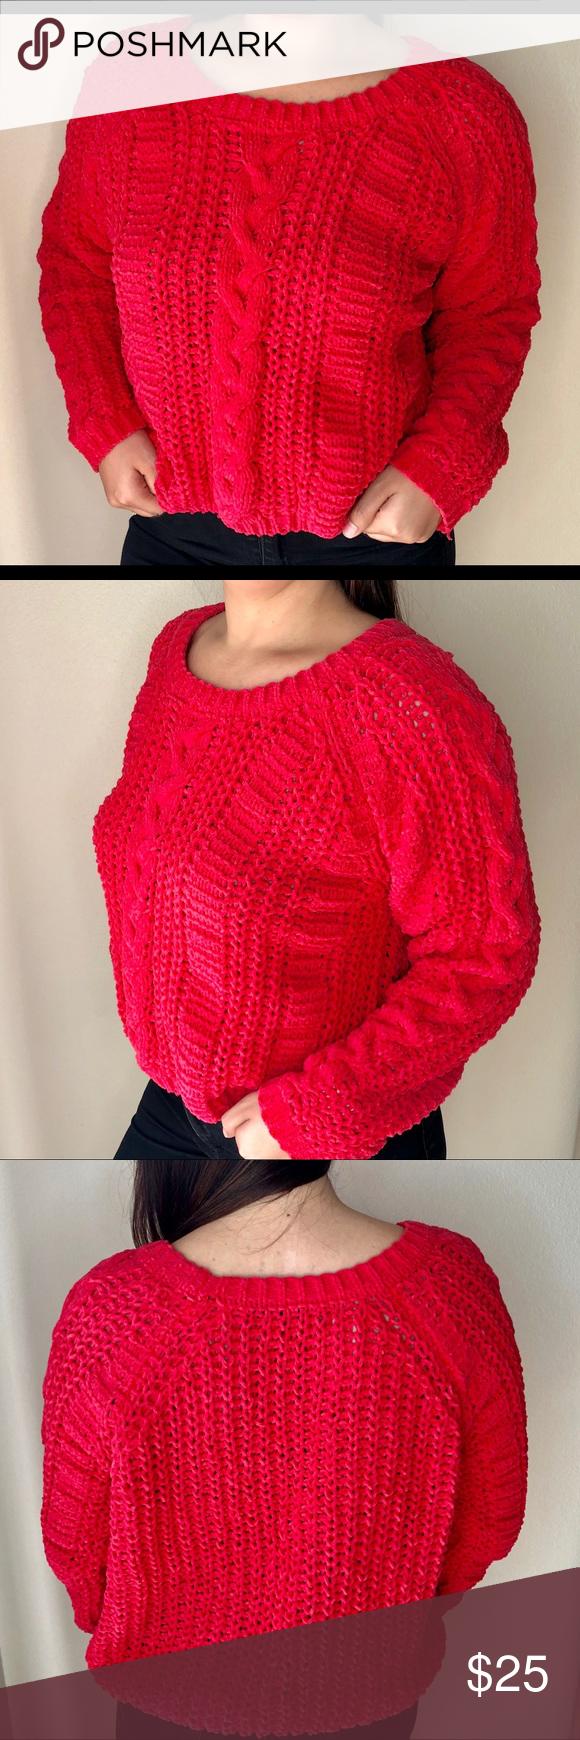 Photo of ZARA KNIT Bright pink chunky knit sweater Zara Knit. Bright pink chunky pull ove…